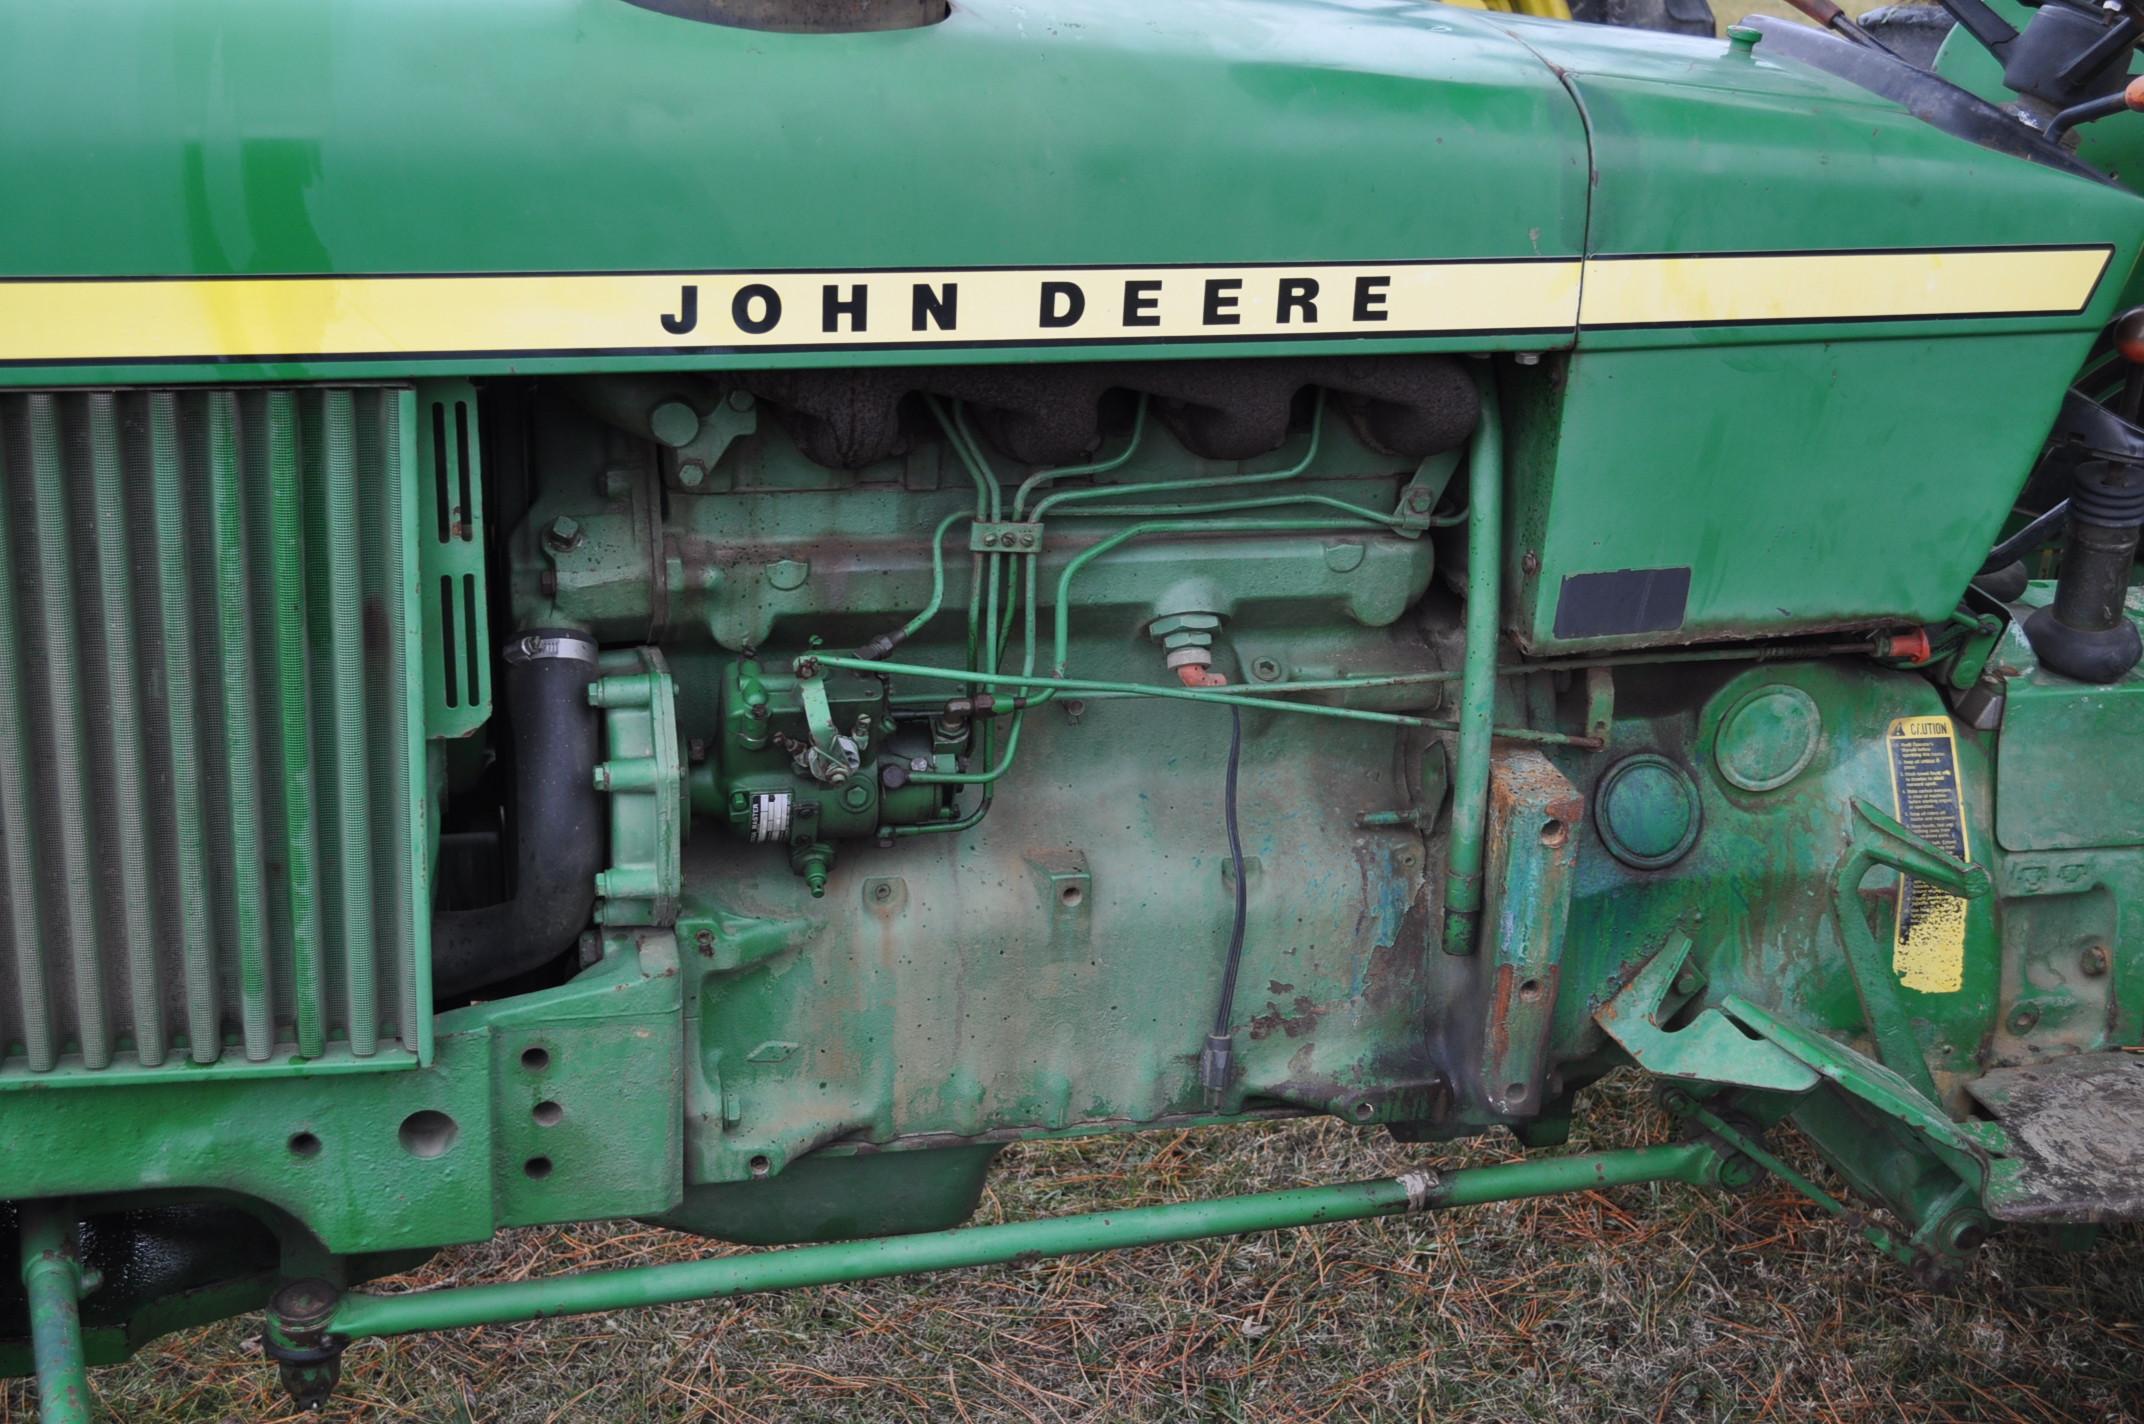 John Deere 2630 tractor, diesel, 16.9-28 rear, 9.5-15 front, 1 hyd remote, 540 pto, 3 pt, 4260 - Image 11 of 18